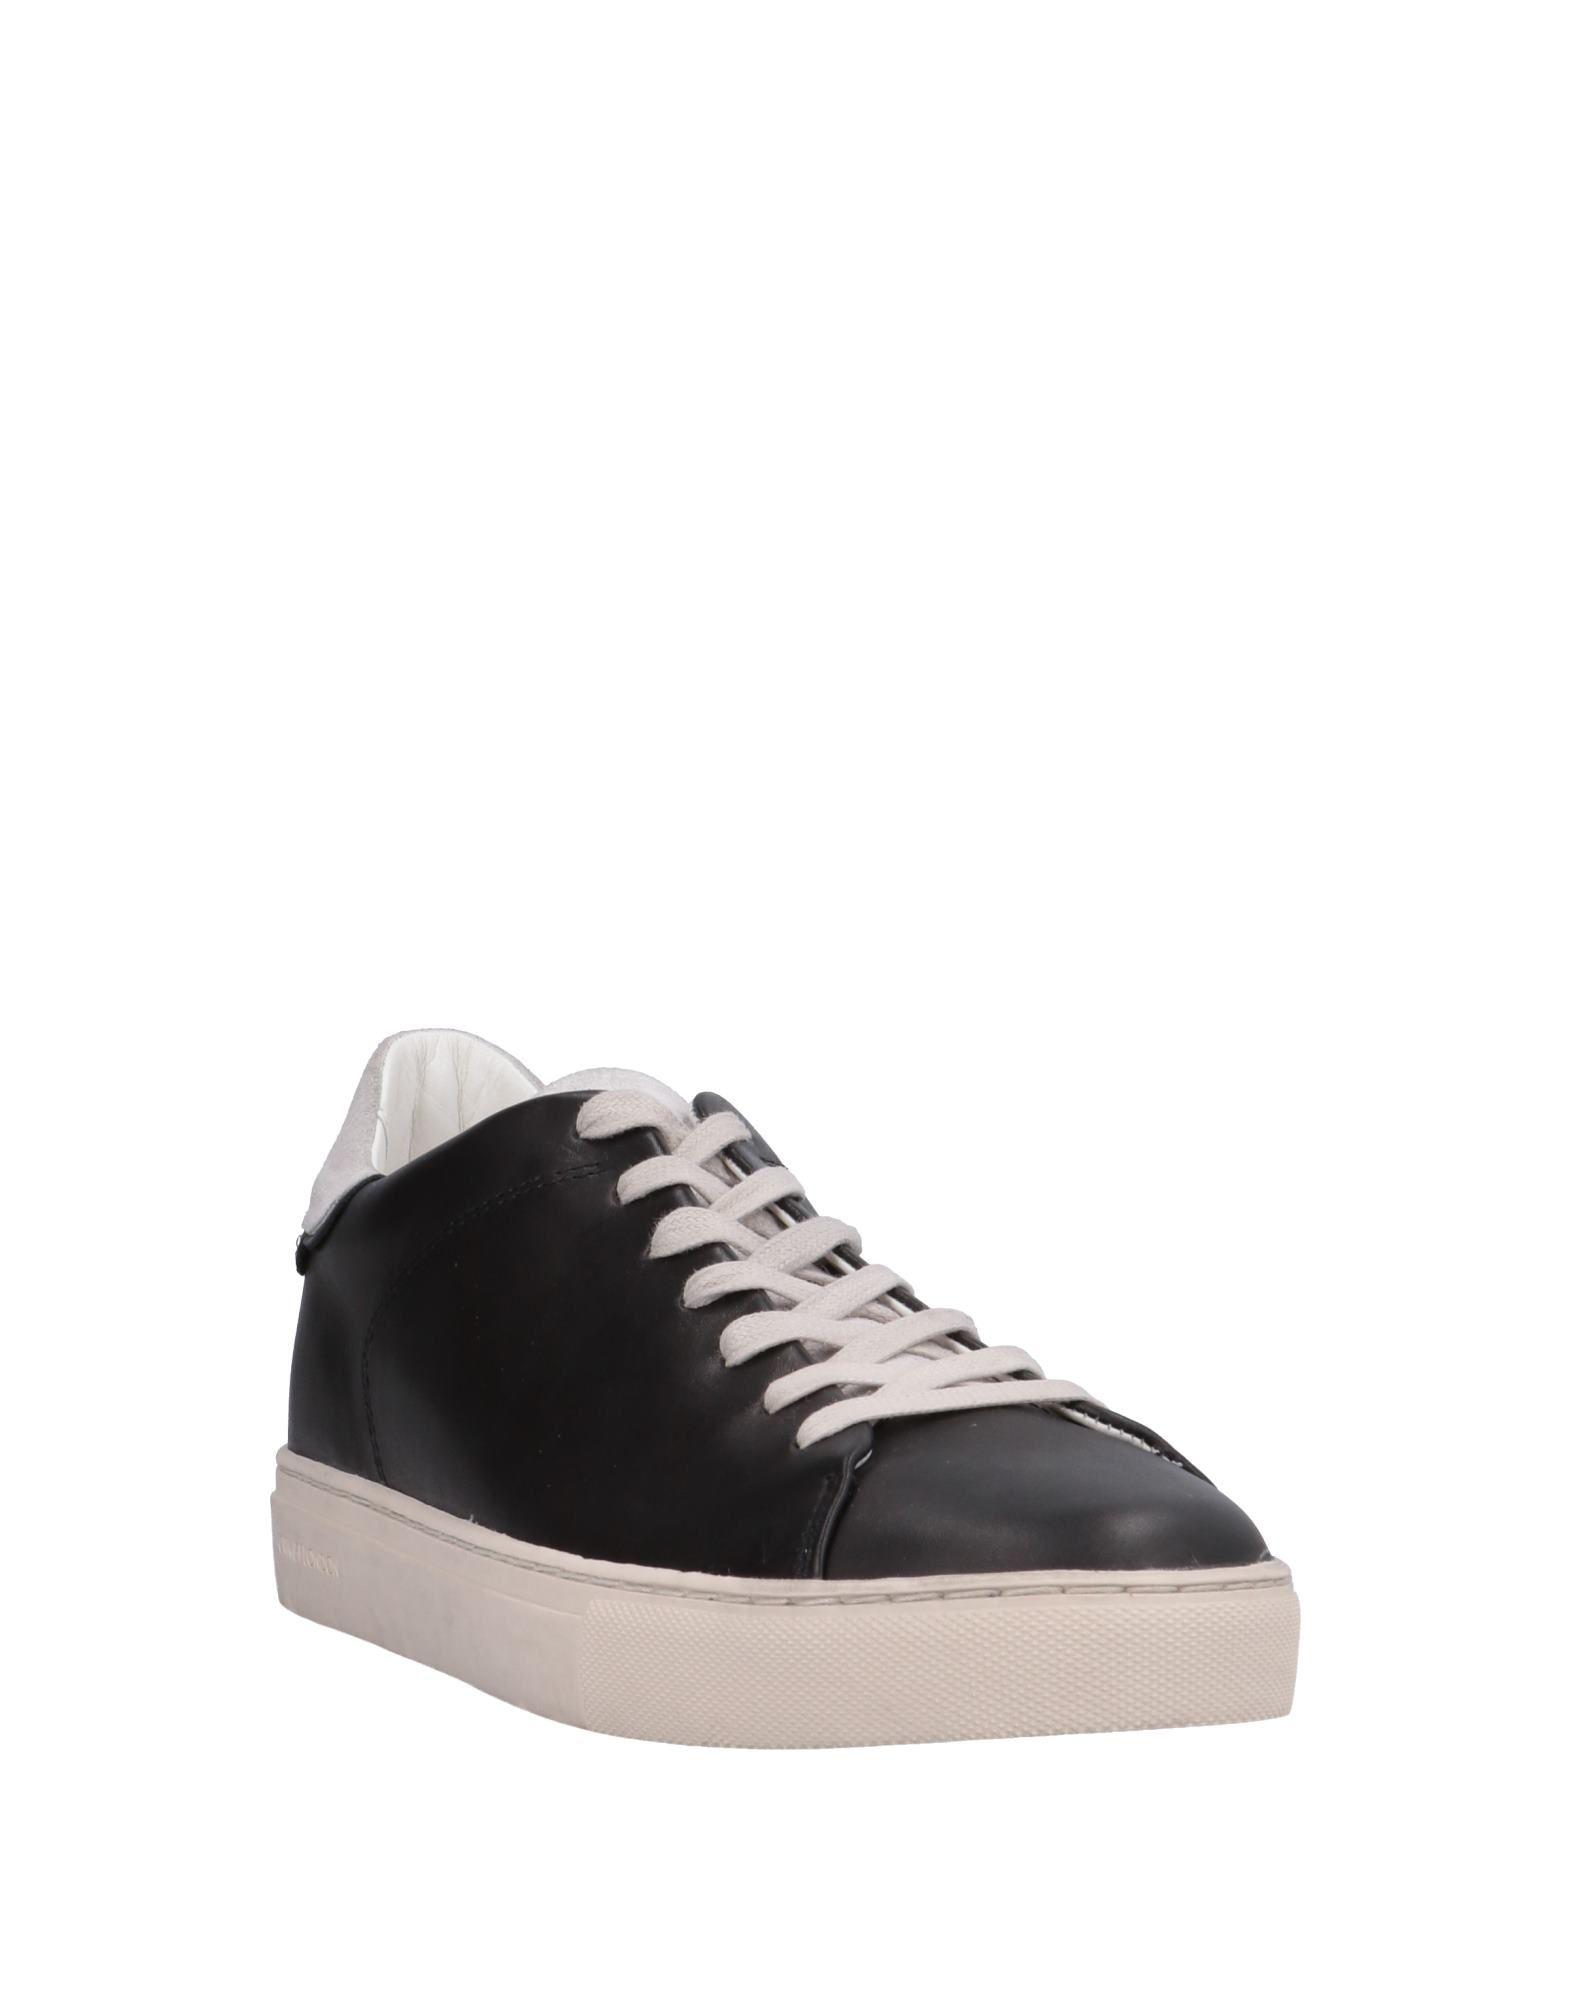 Crime London Sneakers - Men Men Men Crime London Sneakers online on  Canada - 11558862GP e1a3b2